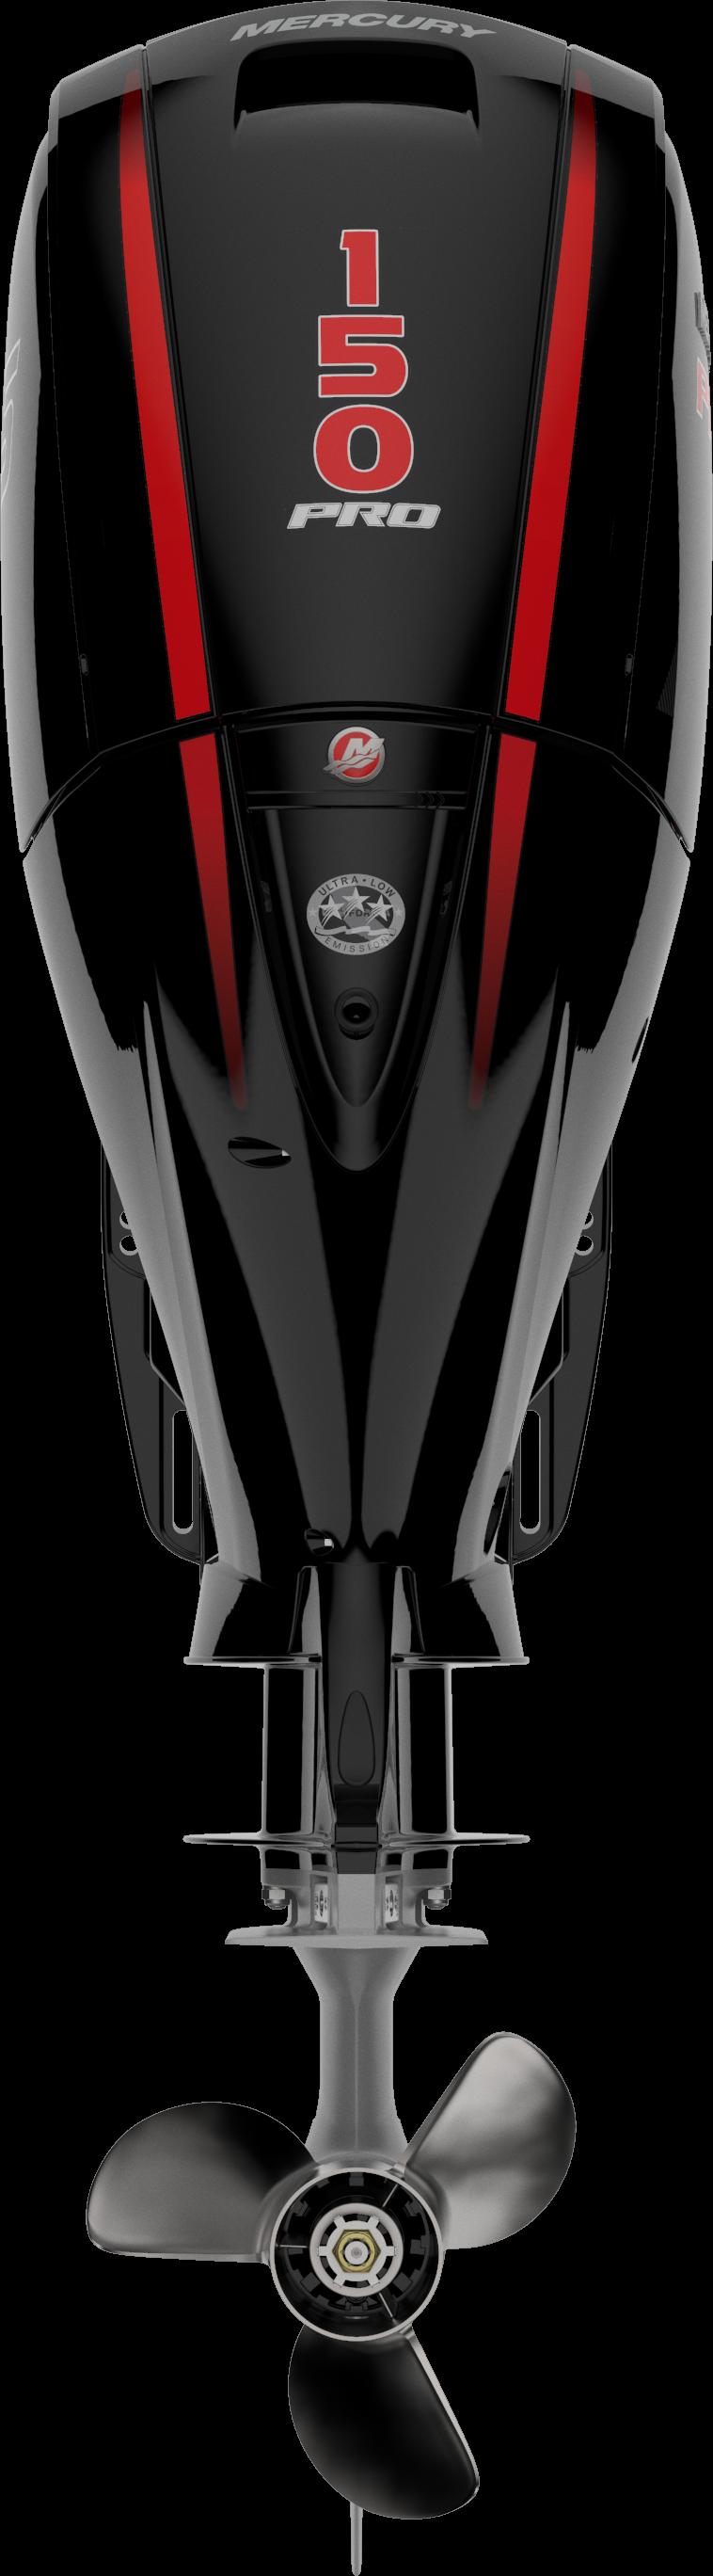 F150 Pro XS νέος κινητήρας mercury